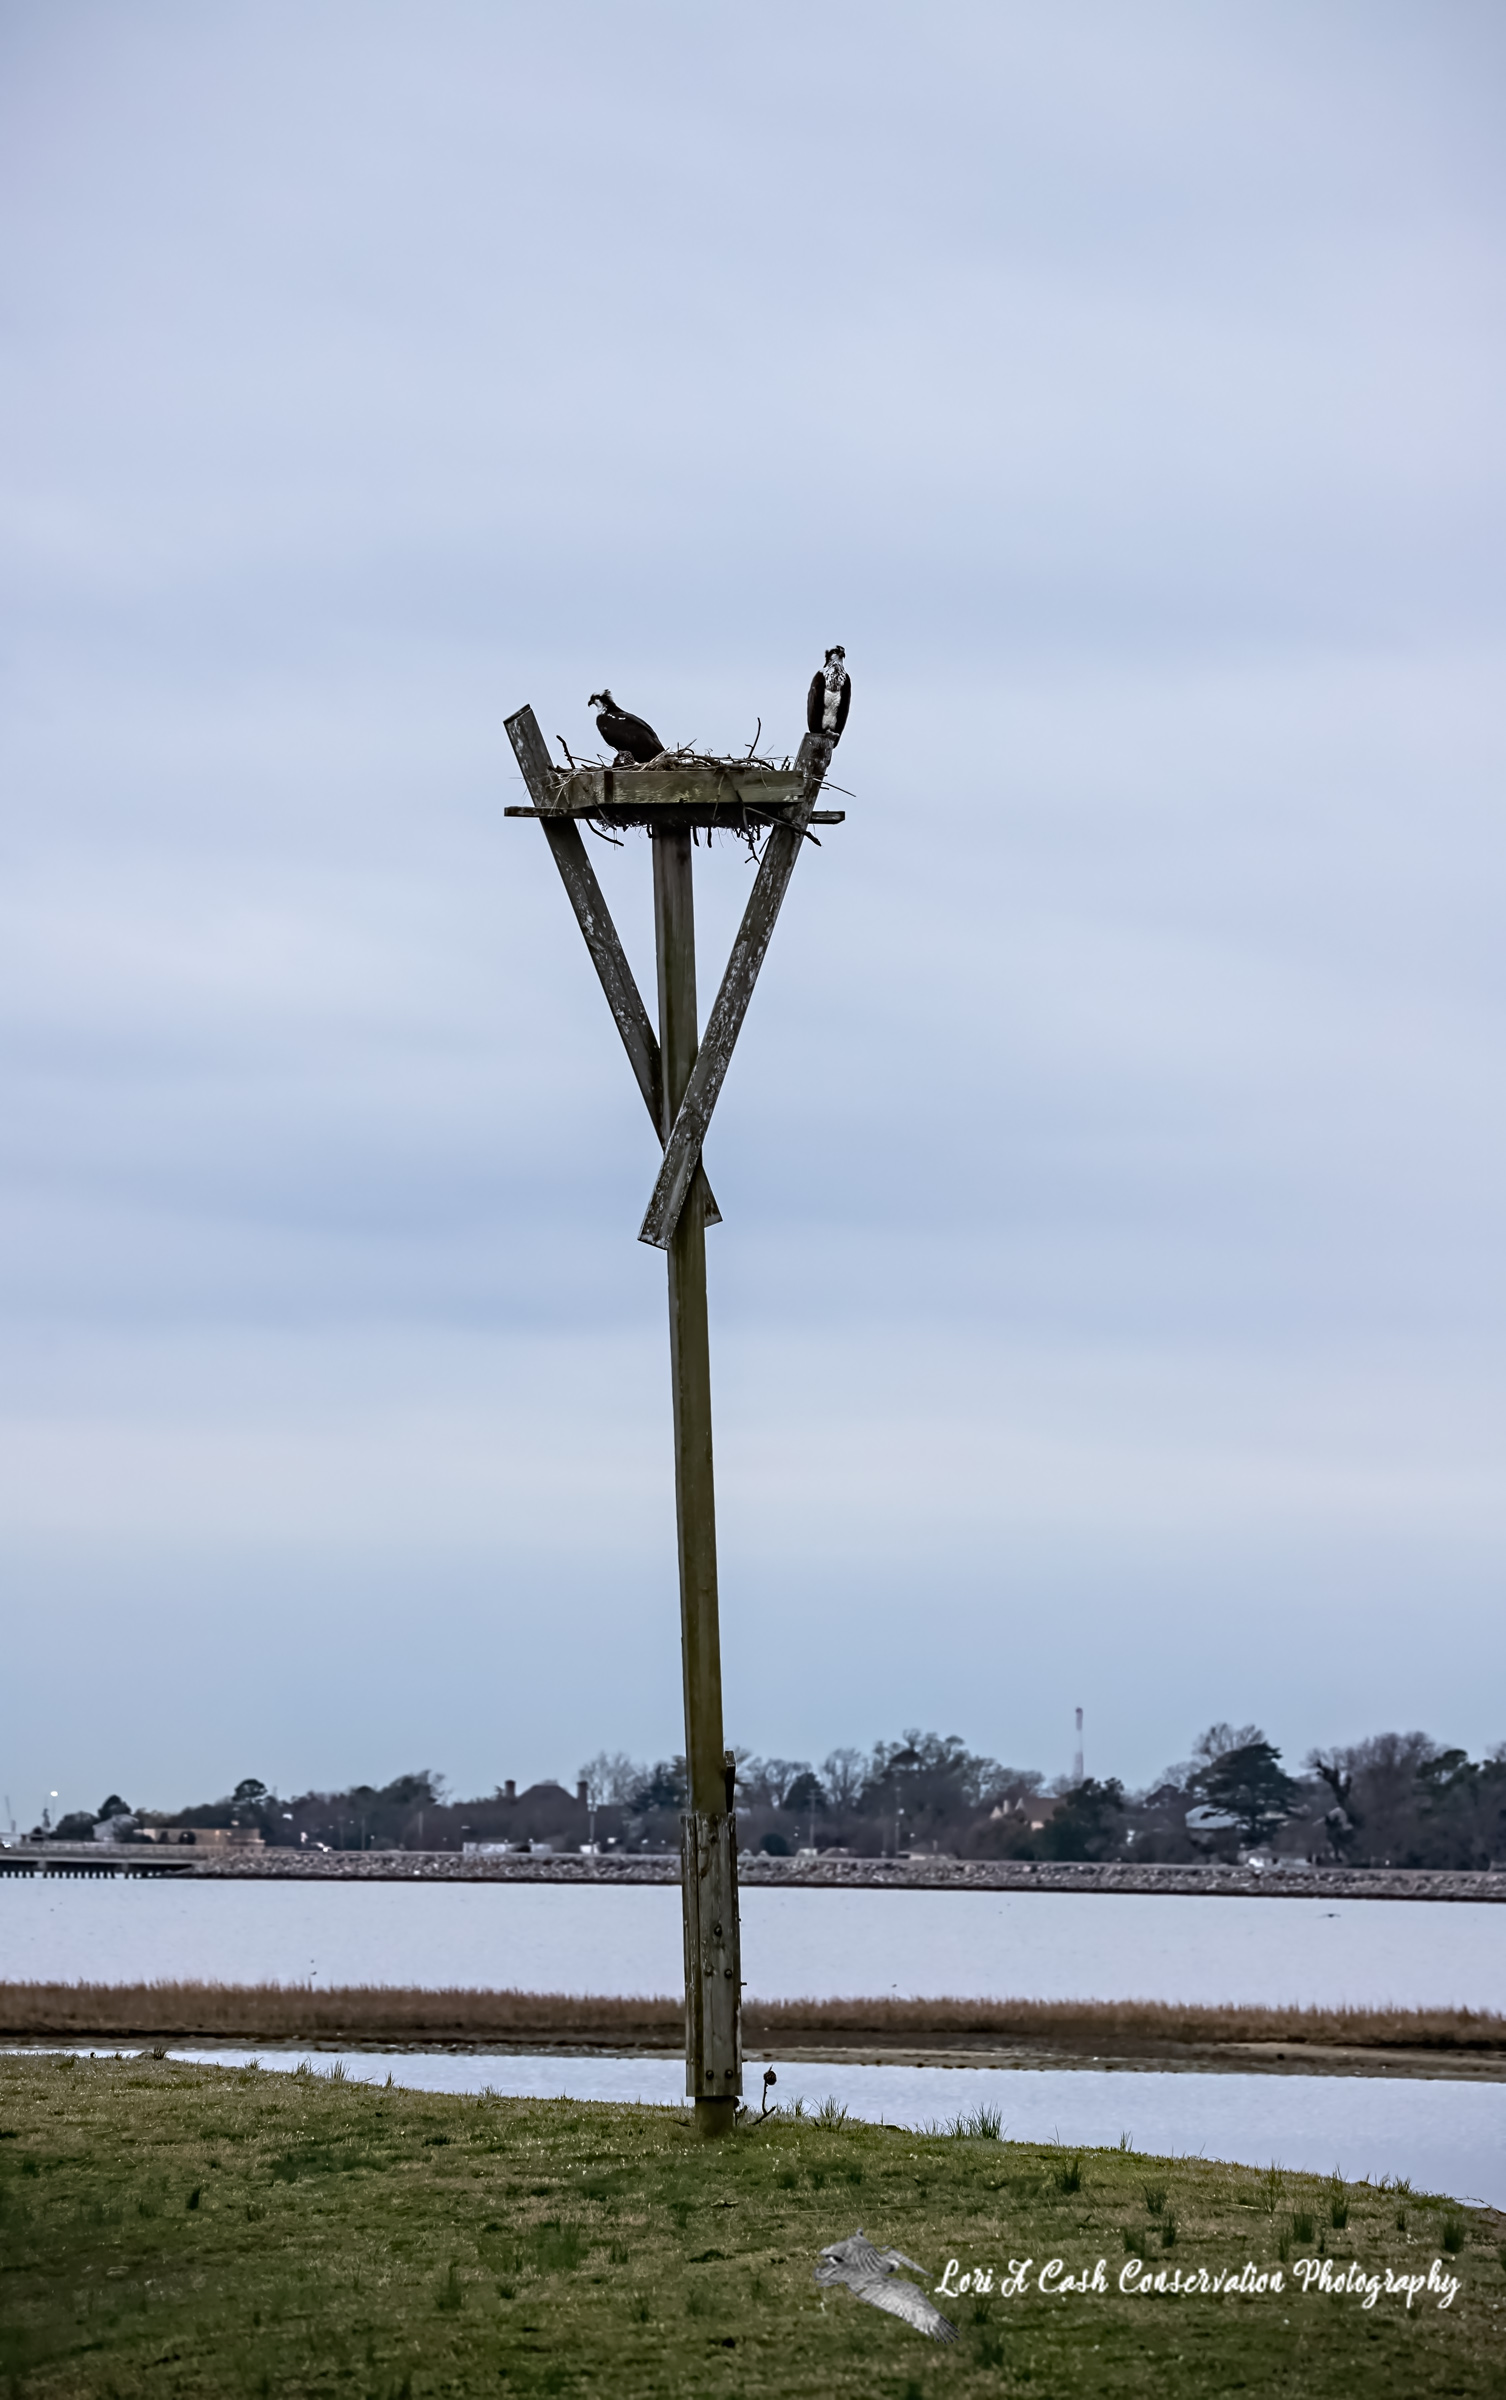 Osprey nest platform with osprey on nest along the edge of Hampton River at Fort Monroe National Monument in Hampton, Virginia.